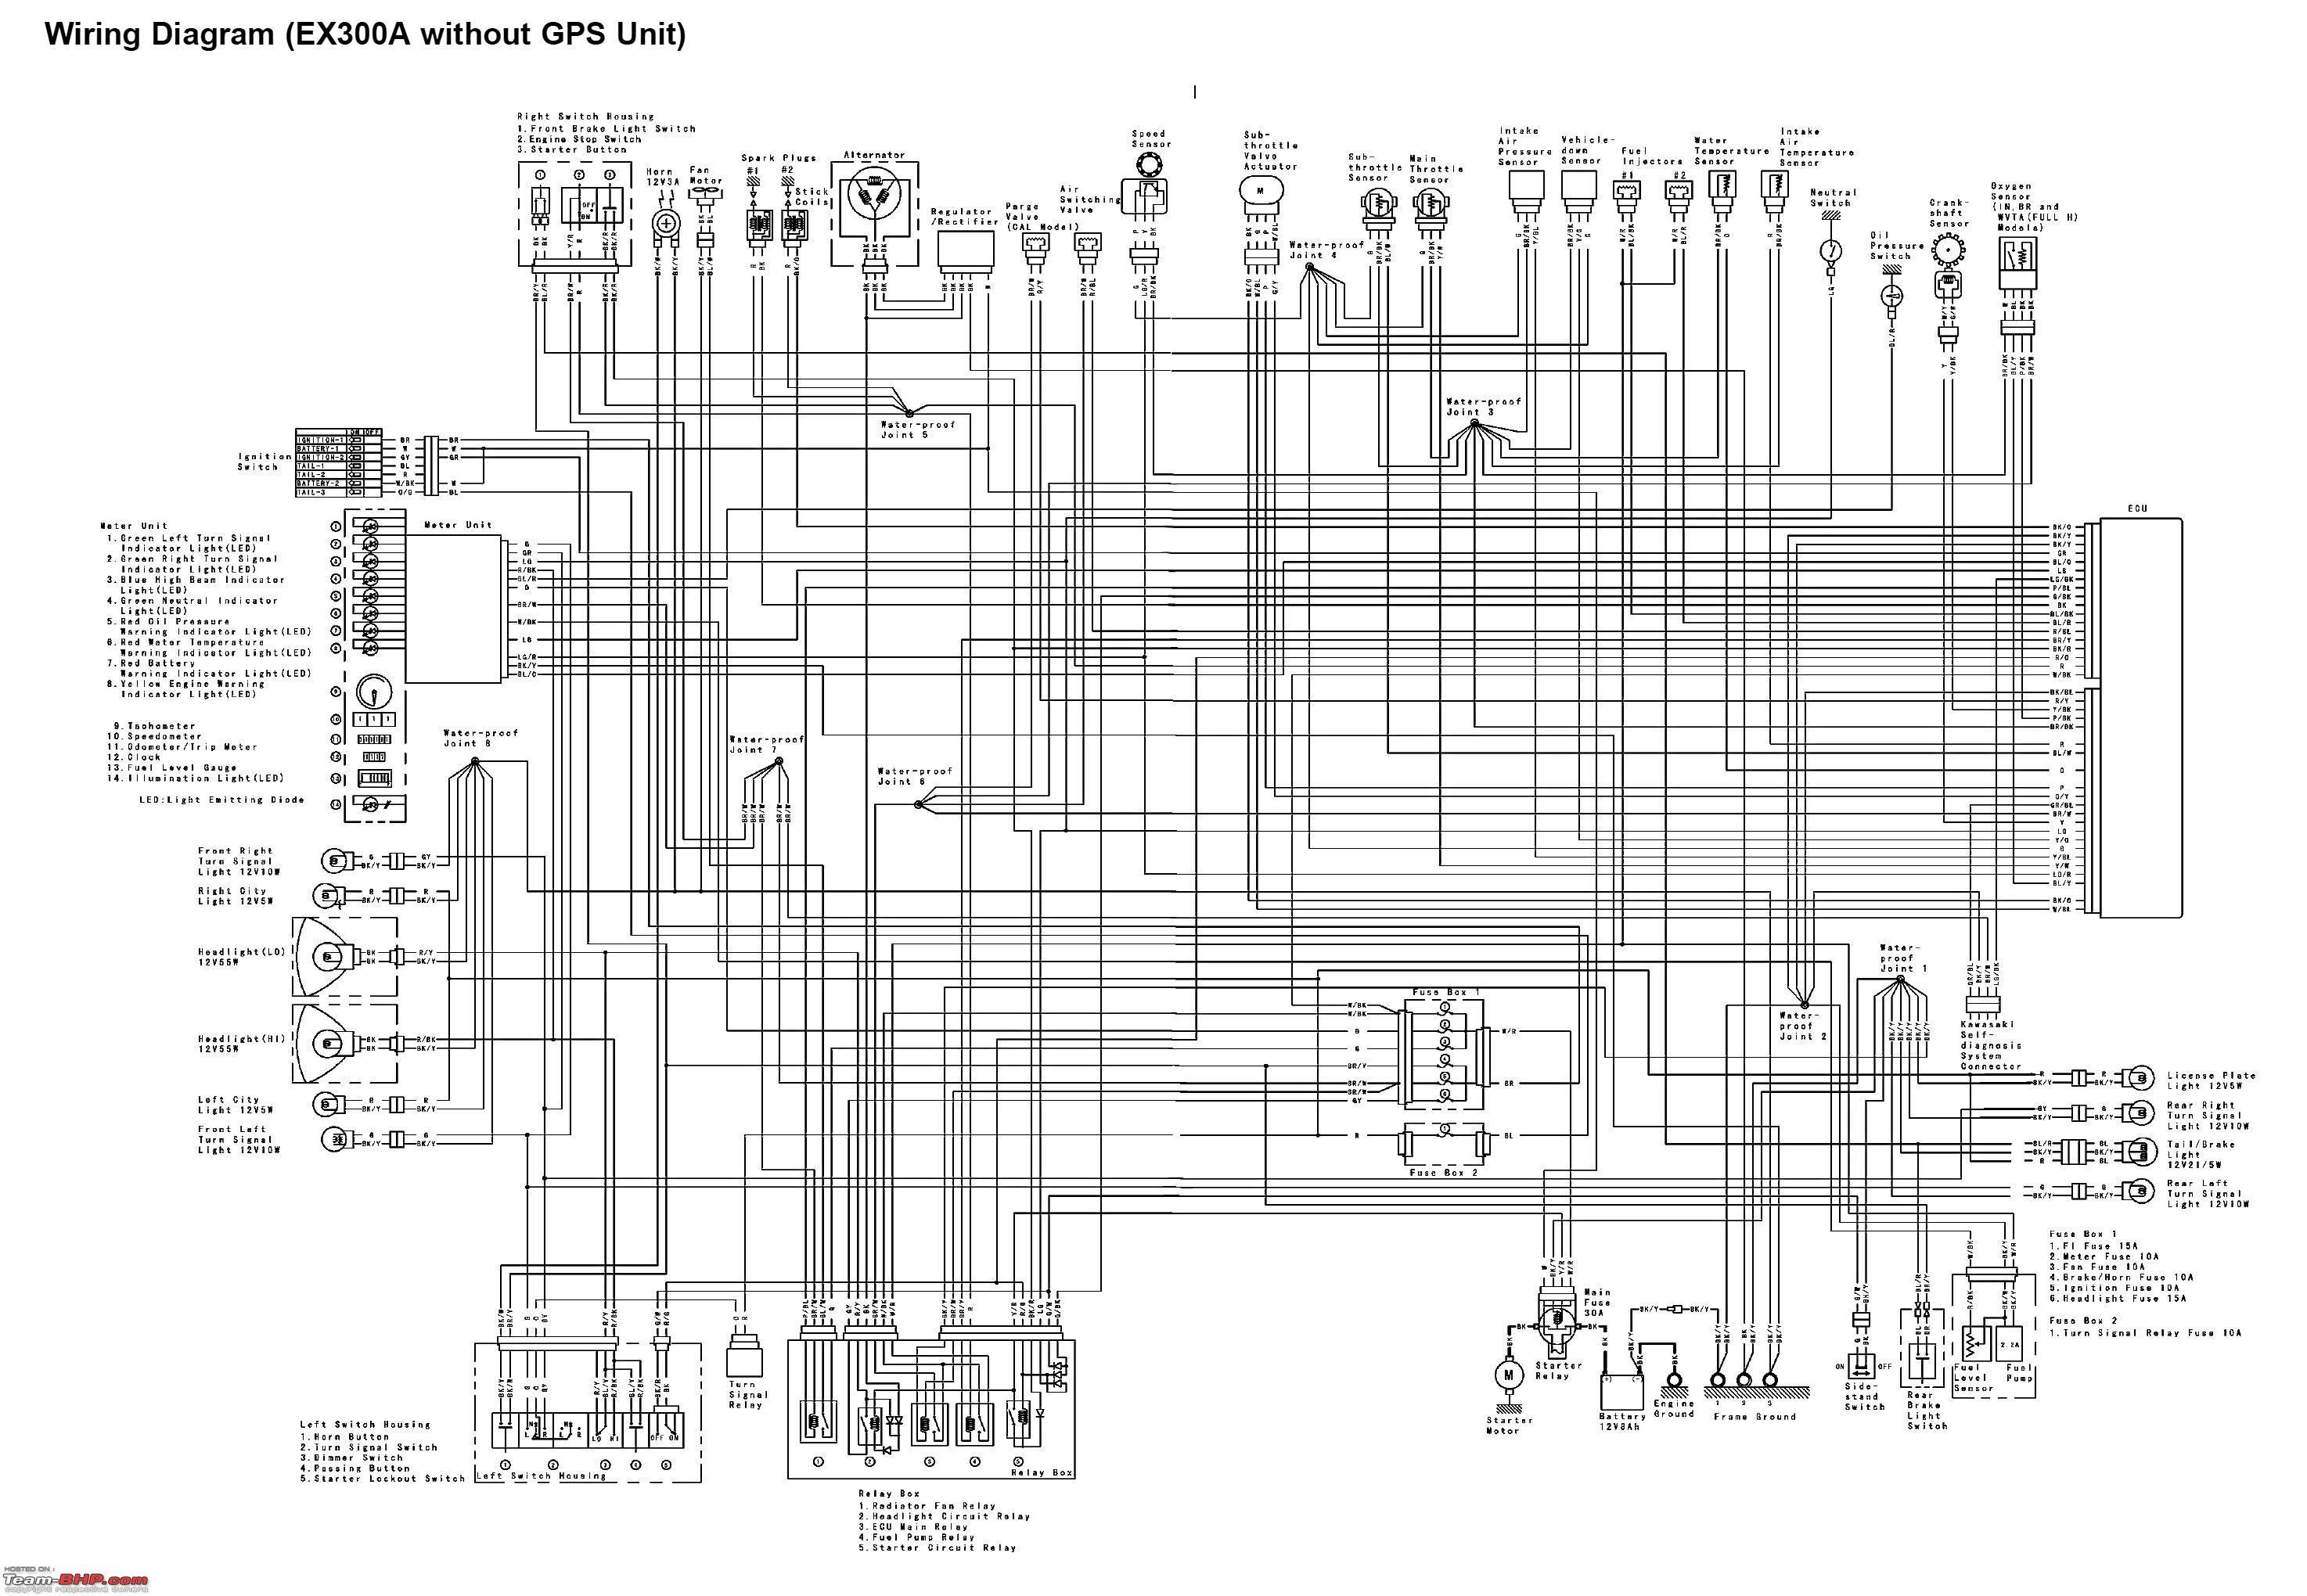 Dryer Wiring Diagram Whirlpool Ler4634